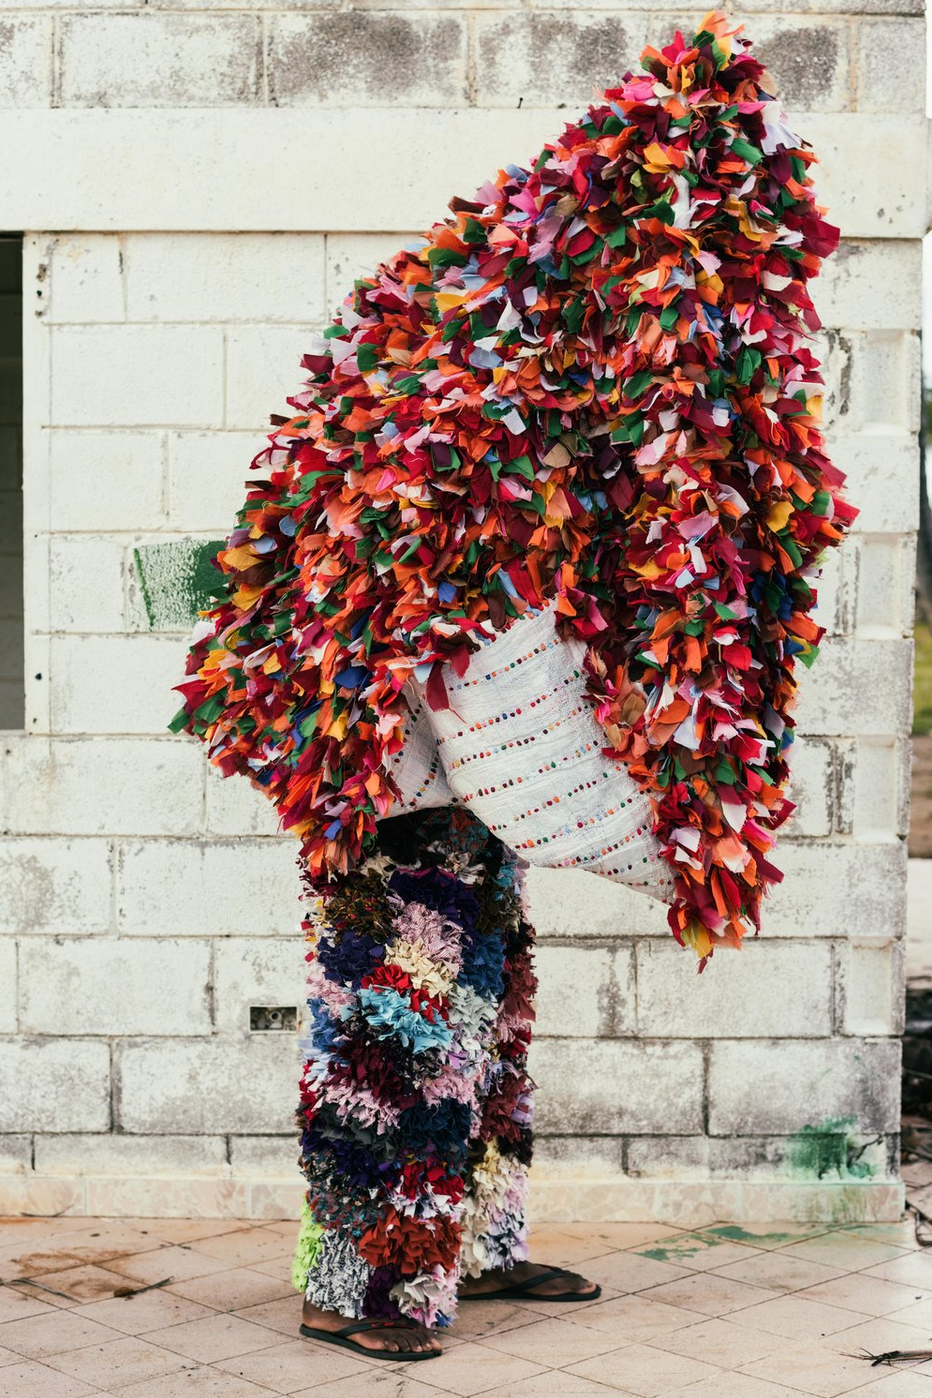 Piñata for a living.